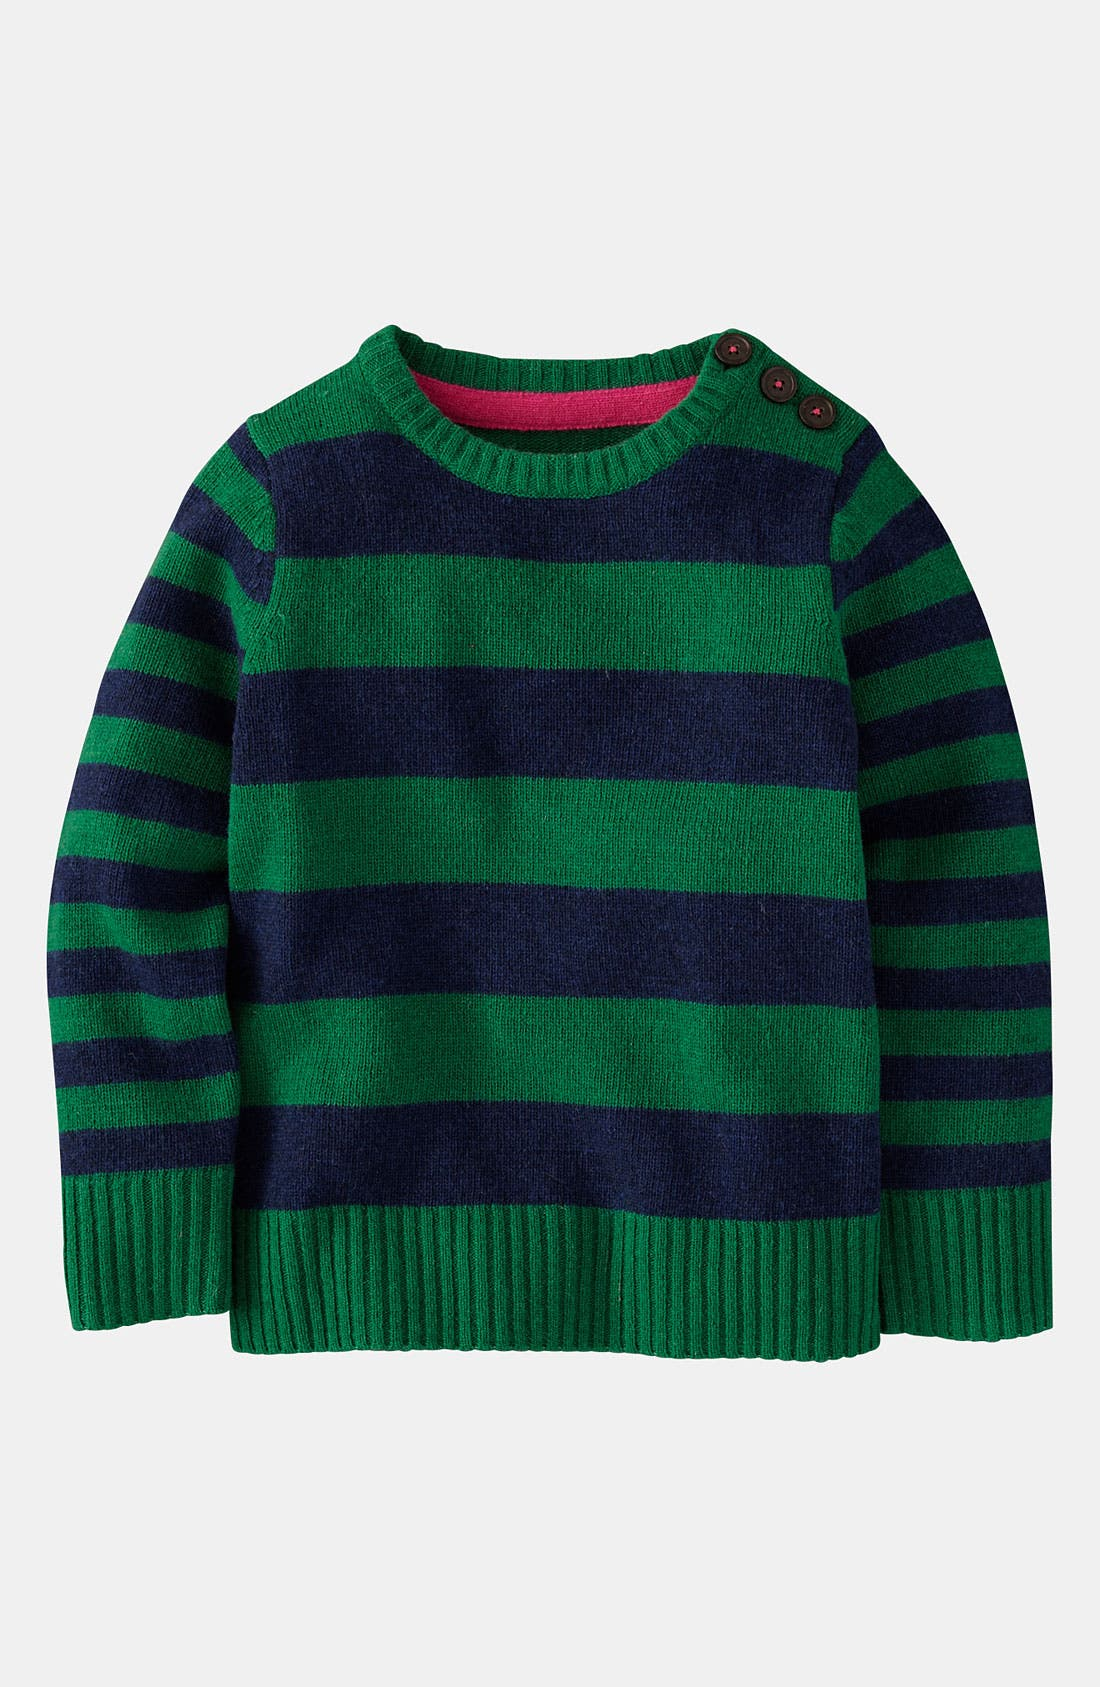 Alternate Image 1 Selected - Mini Boden Sweater (Little Boys & Big Boys)